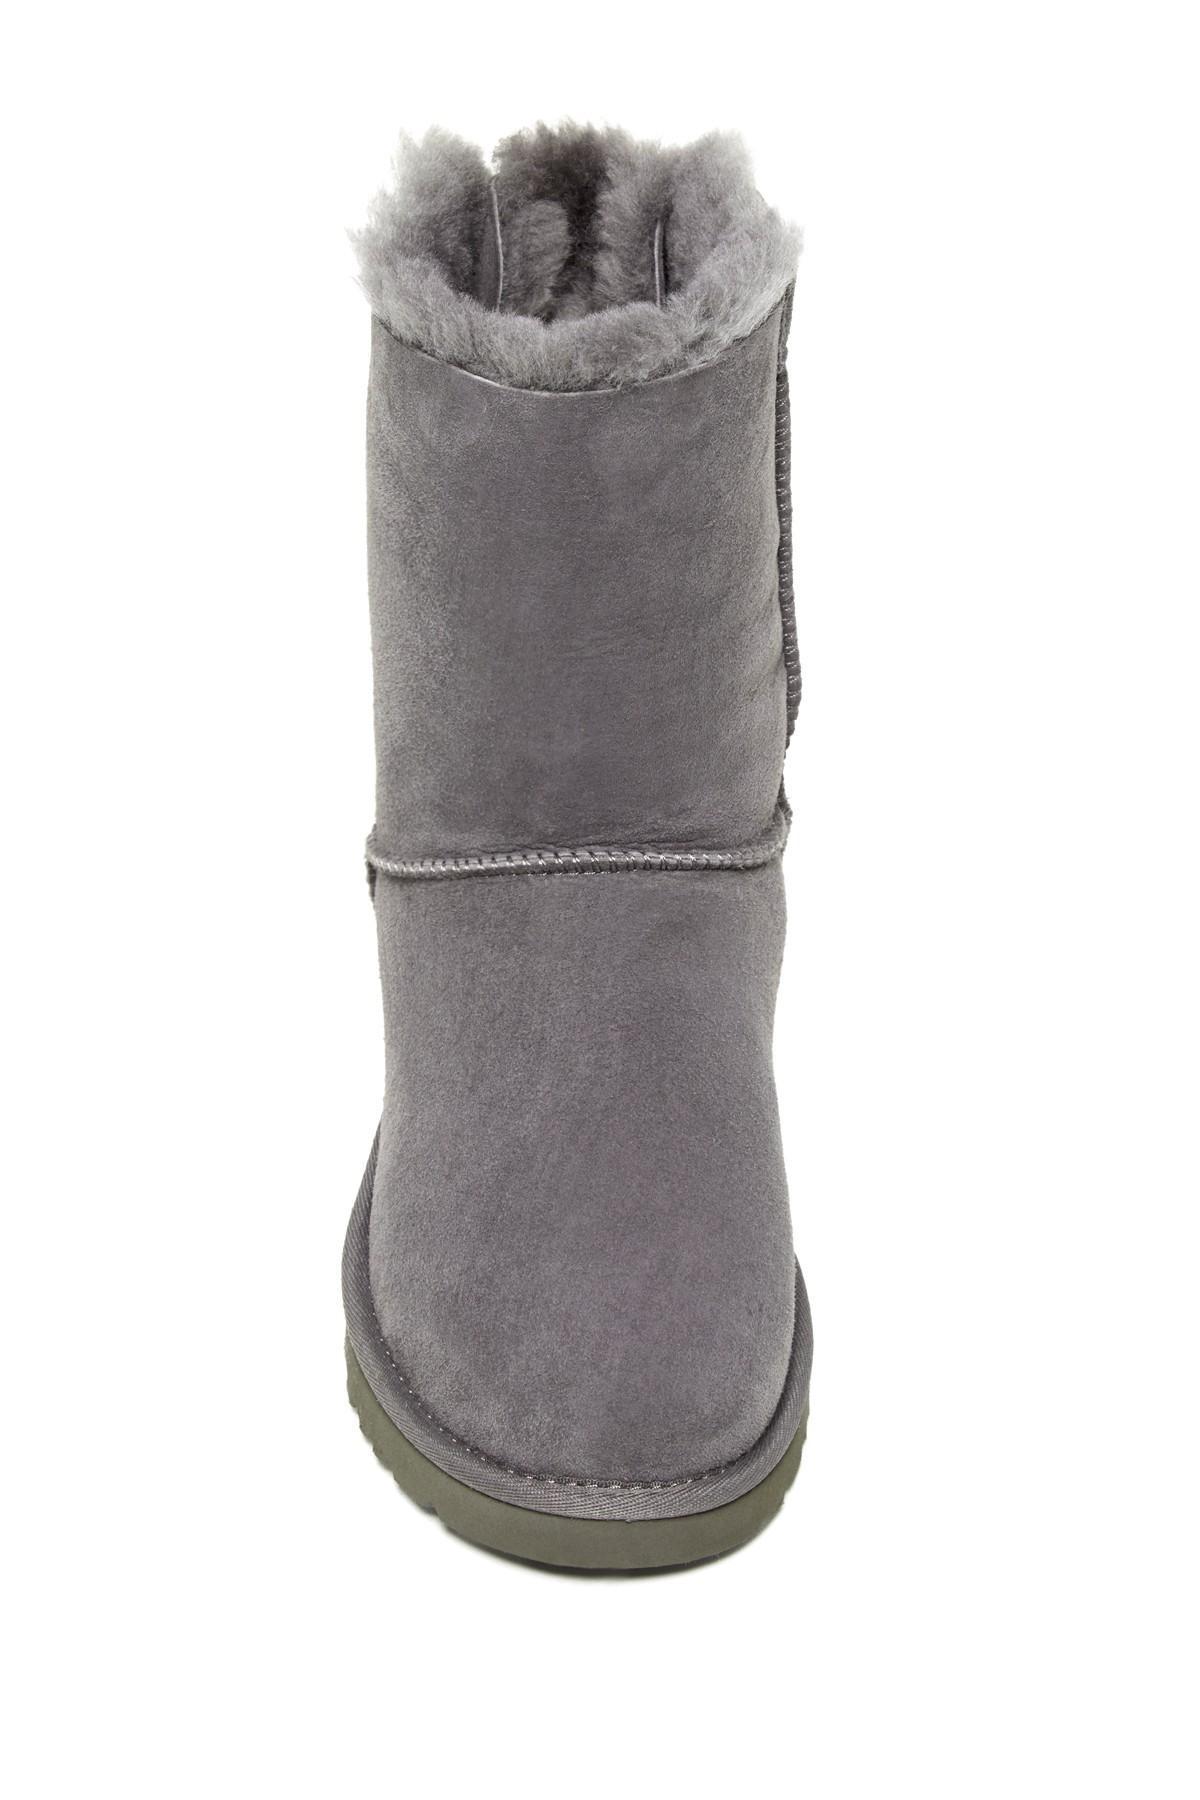 4feb2c8a373 Women's Gray Bailey Twinface Genuine Shearling & Pure(tm) Bow Corduroy Boot